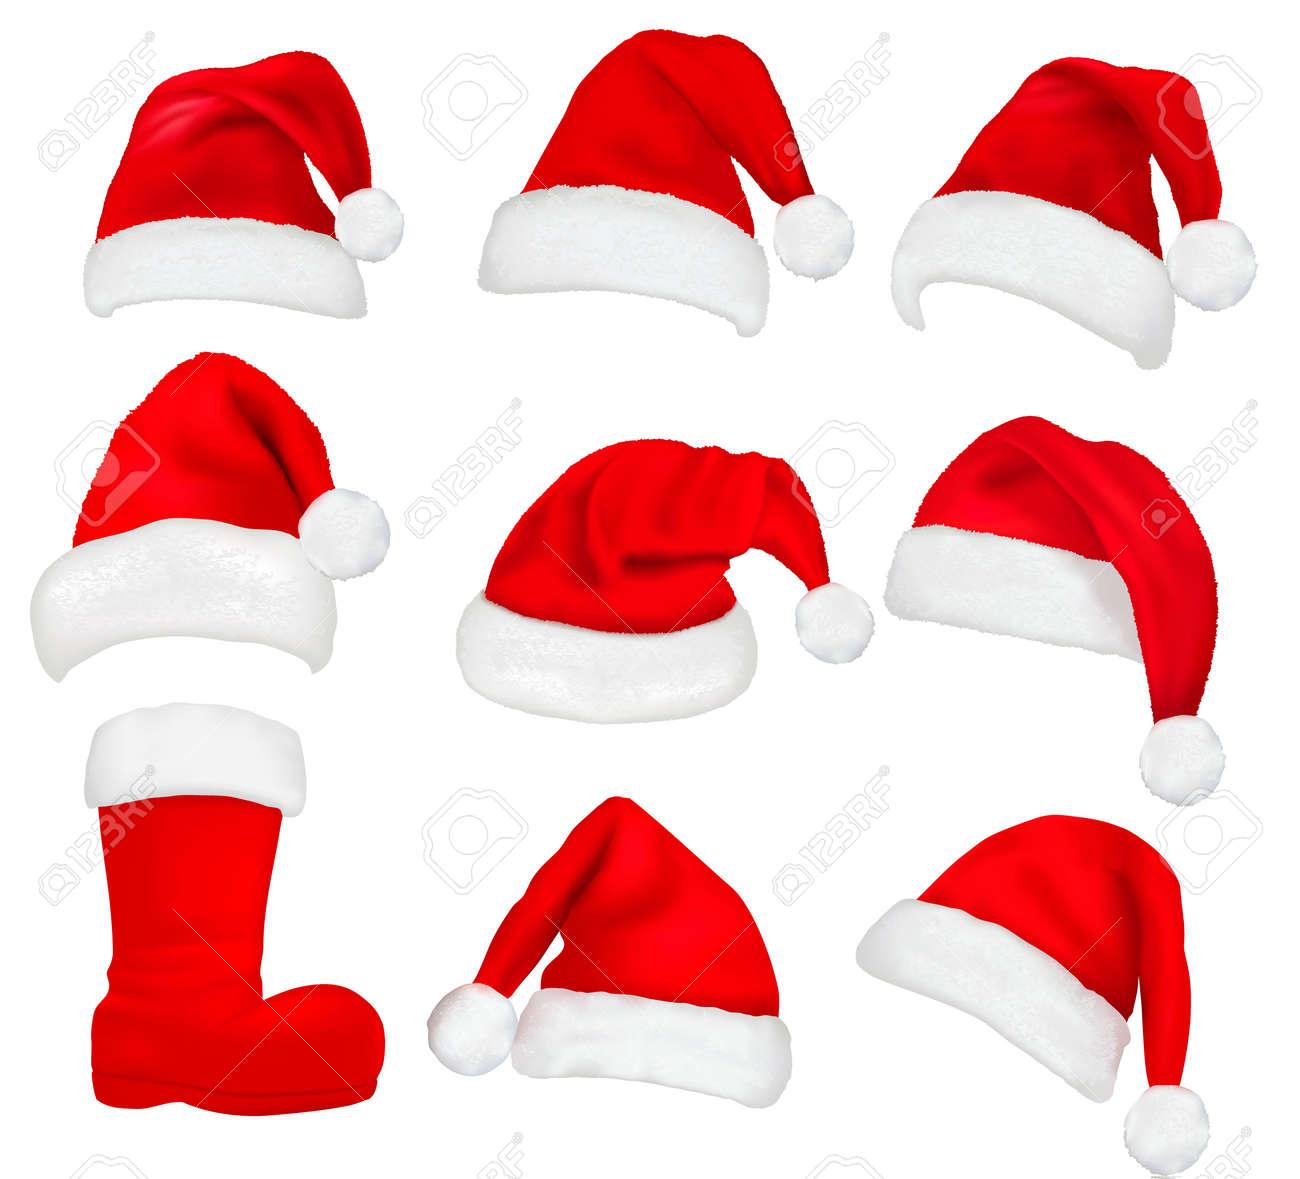 809b1107bdaa5 Big set of red santa hats and boot. Vector illustration. Stock Vector -  11145963